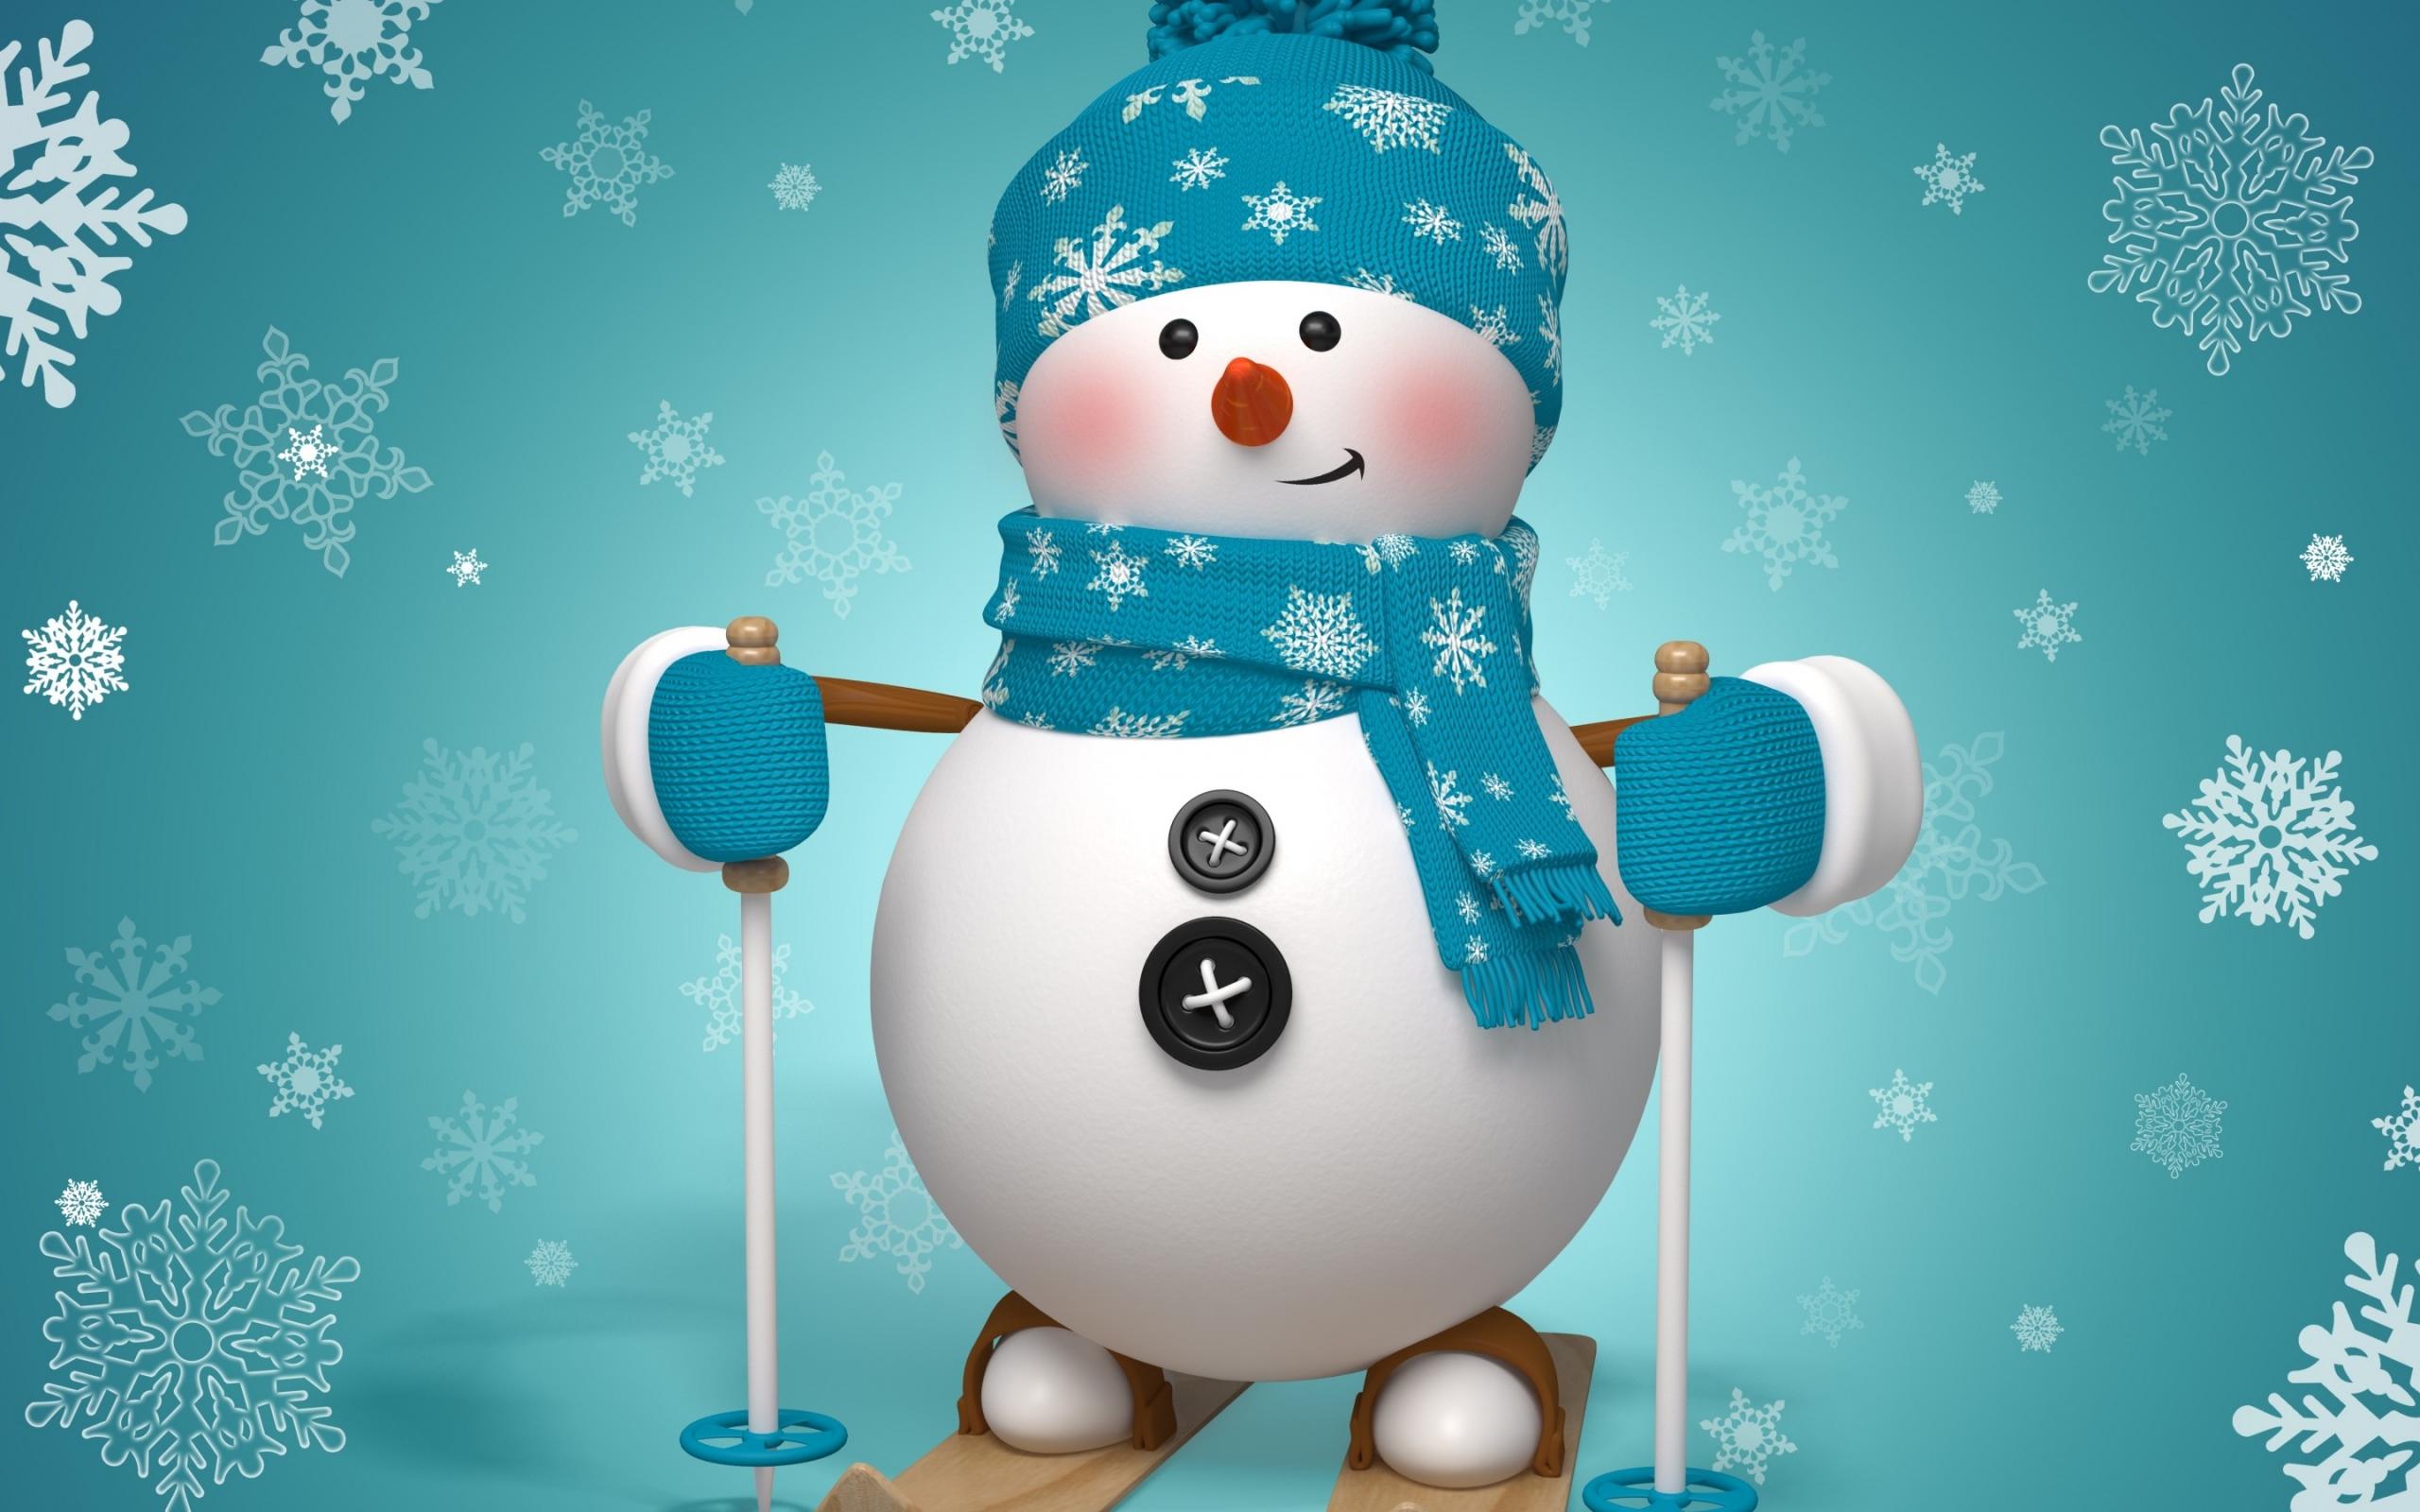 Snowman HD Wallpaper